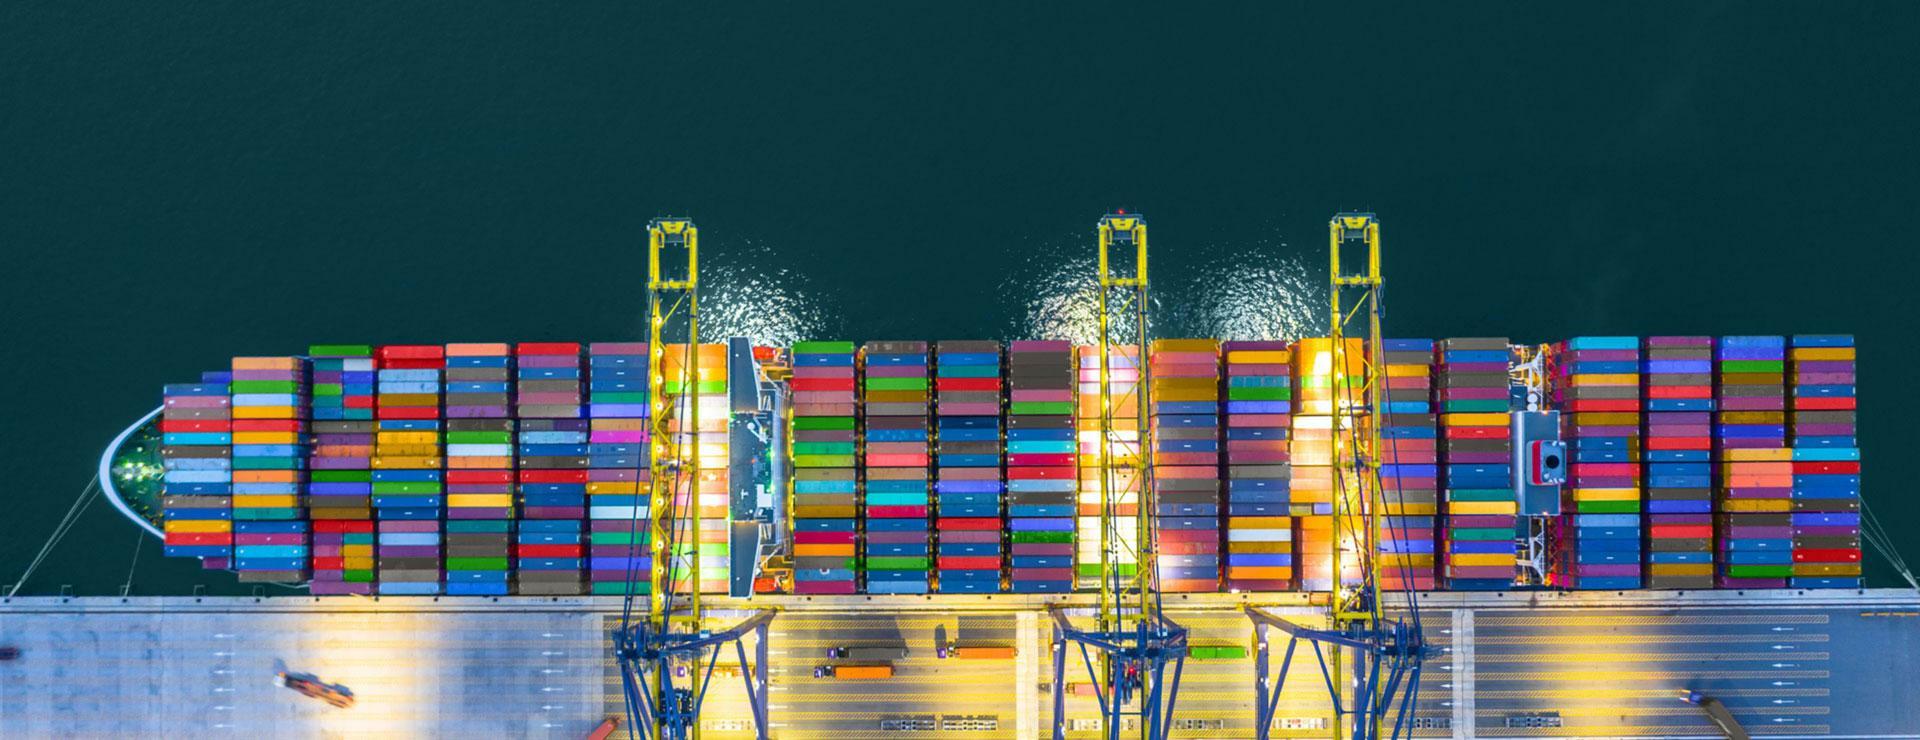 harborside_logistics_shipping